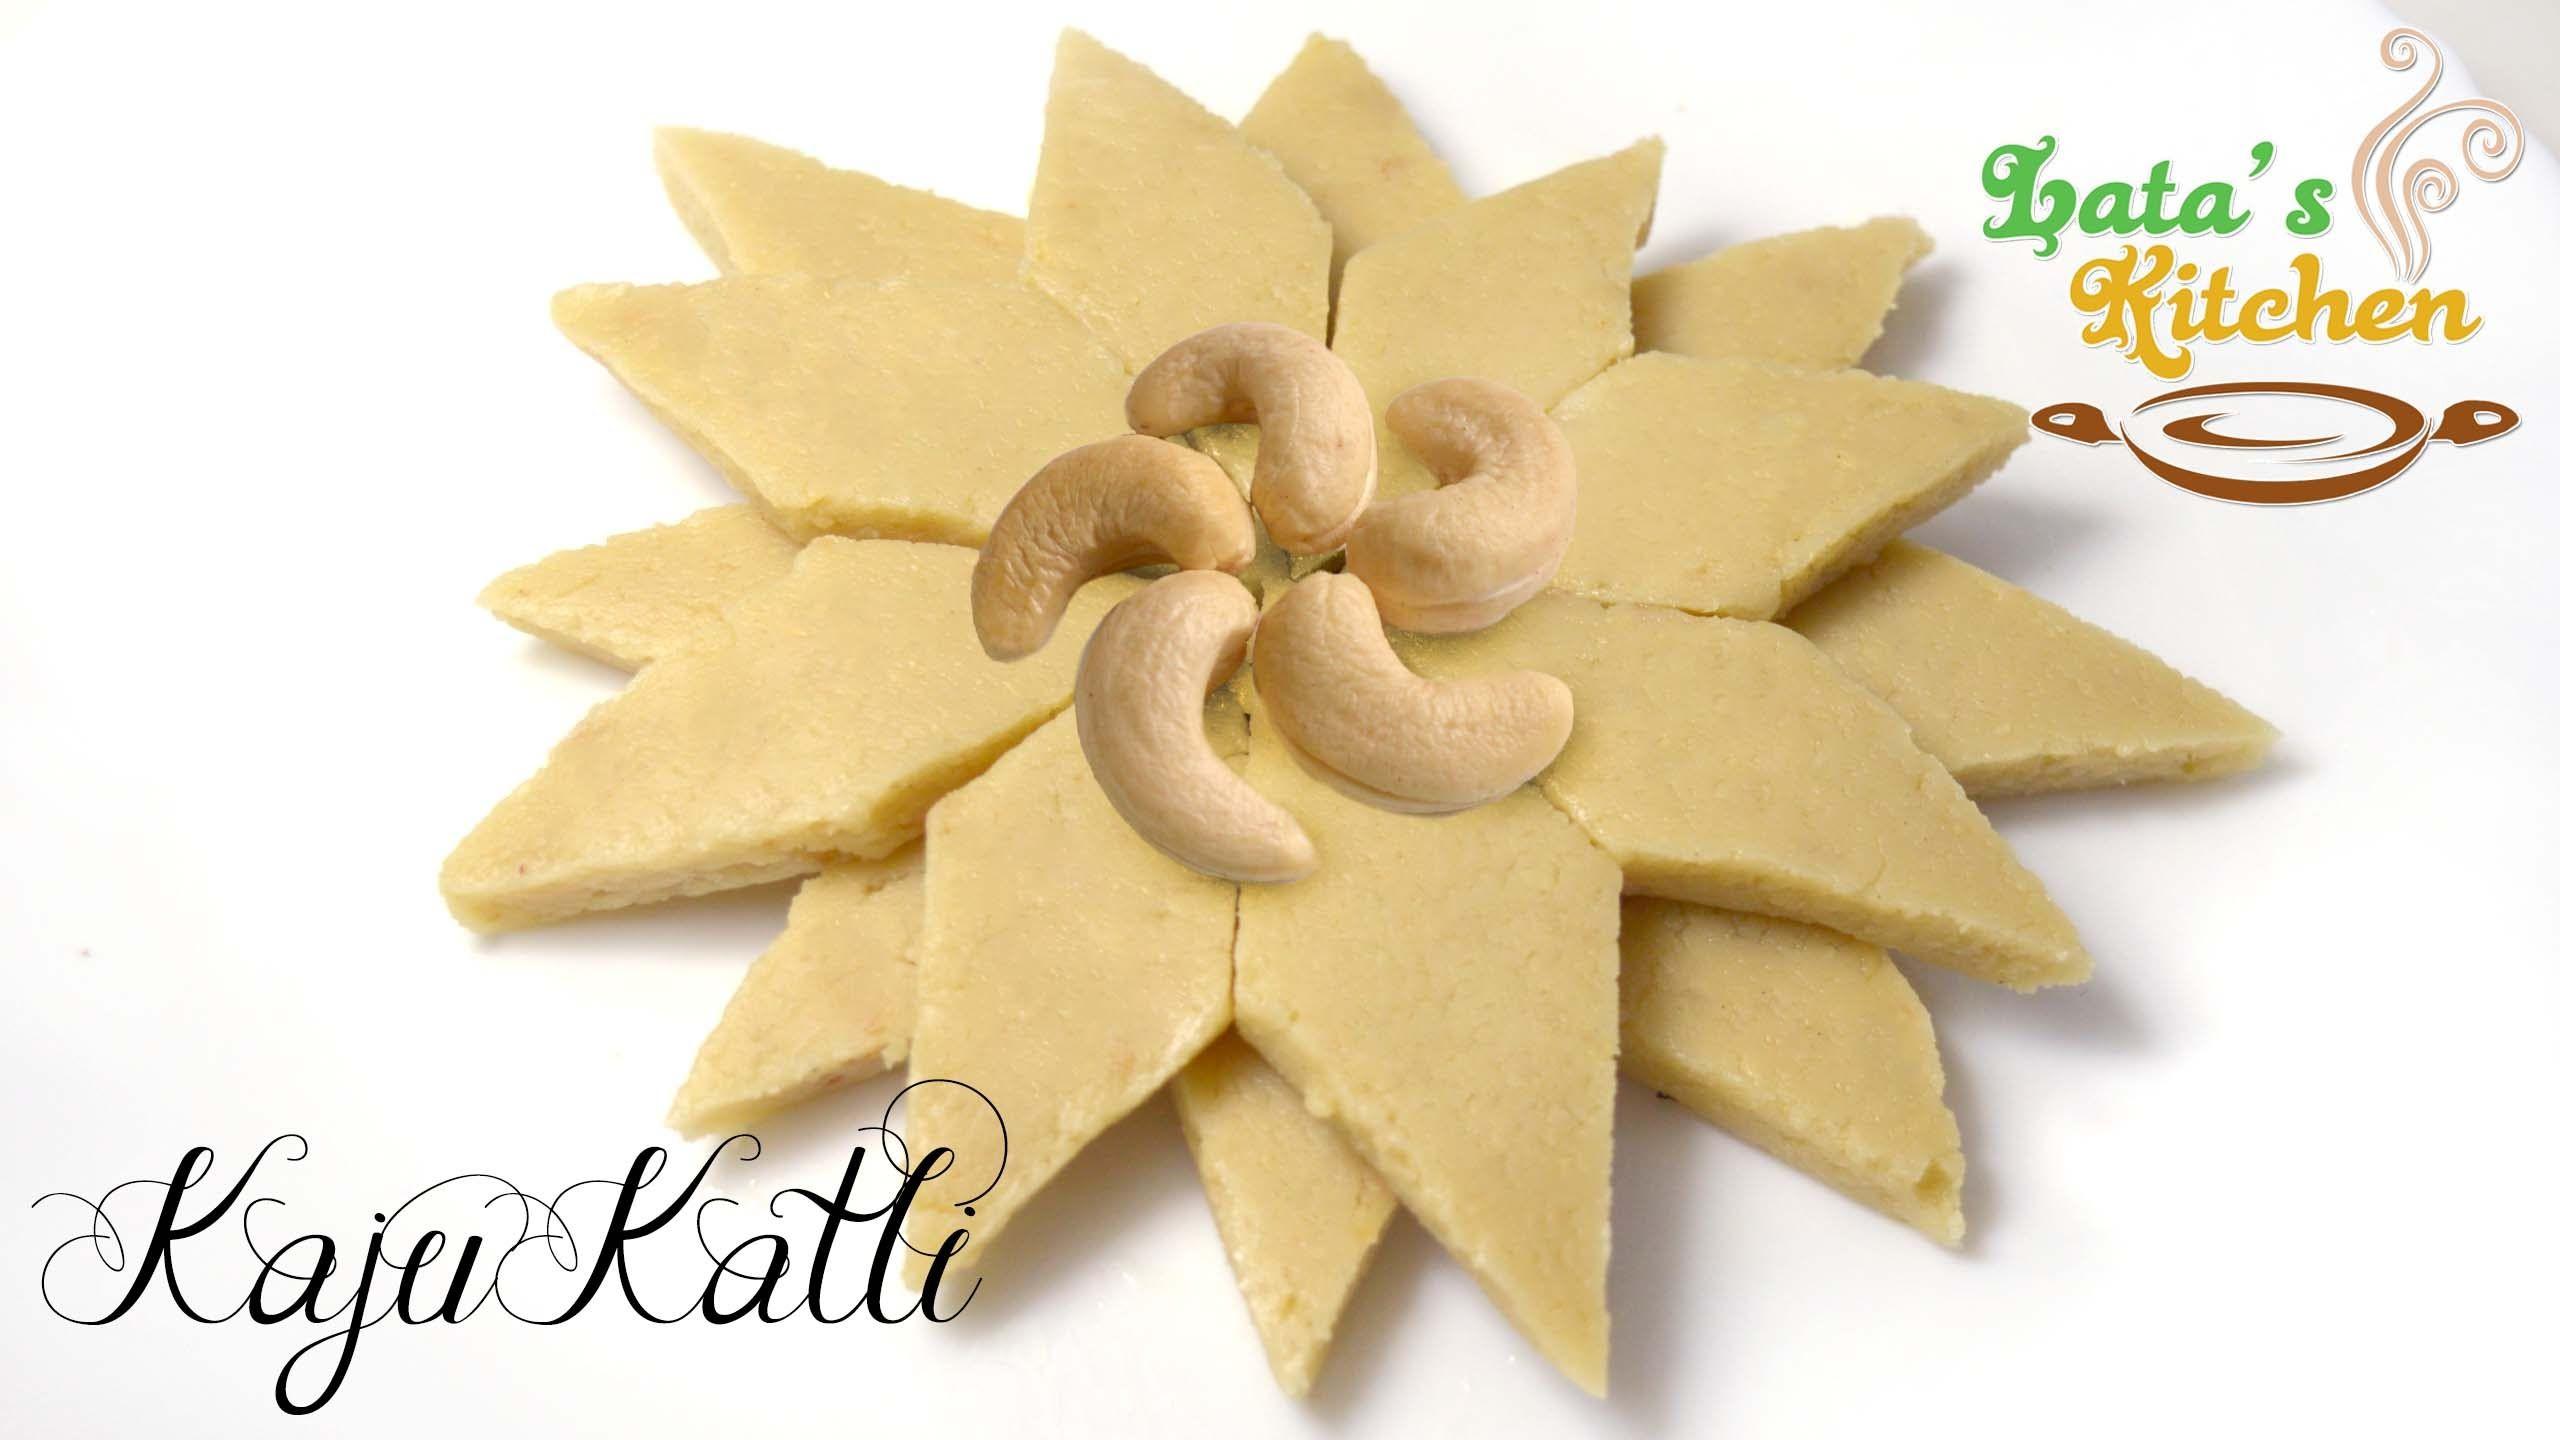 Kaju katli recipe kaju barfi indian vegetarian dessert kaju katli recipe kaju barfi indian vegetarian dessert recipe in hindi with english forumfinder Image collections